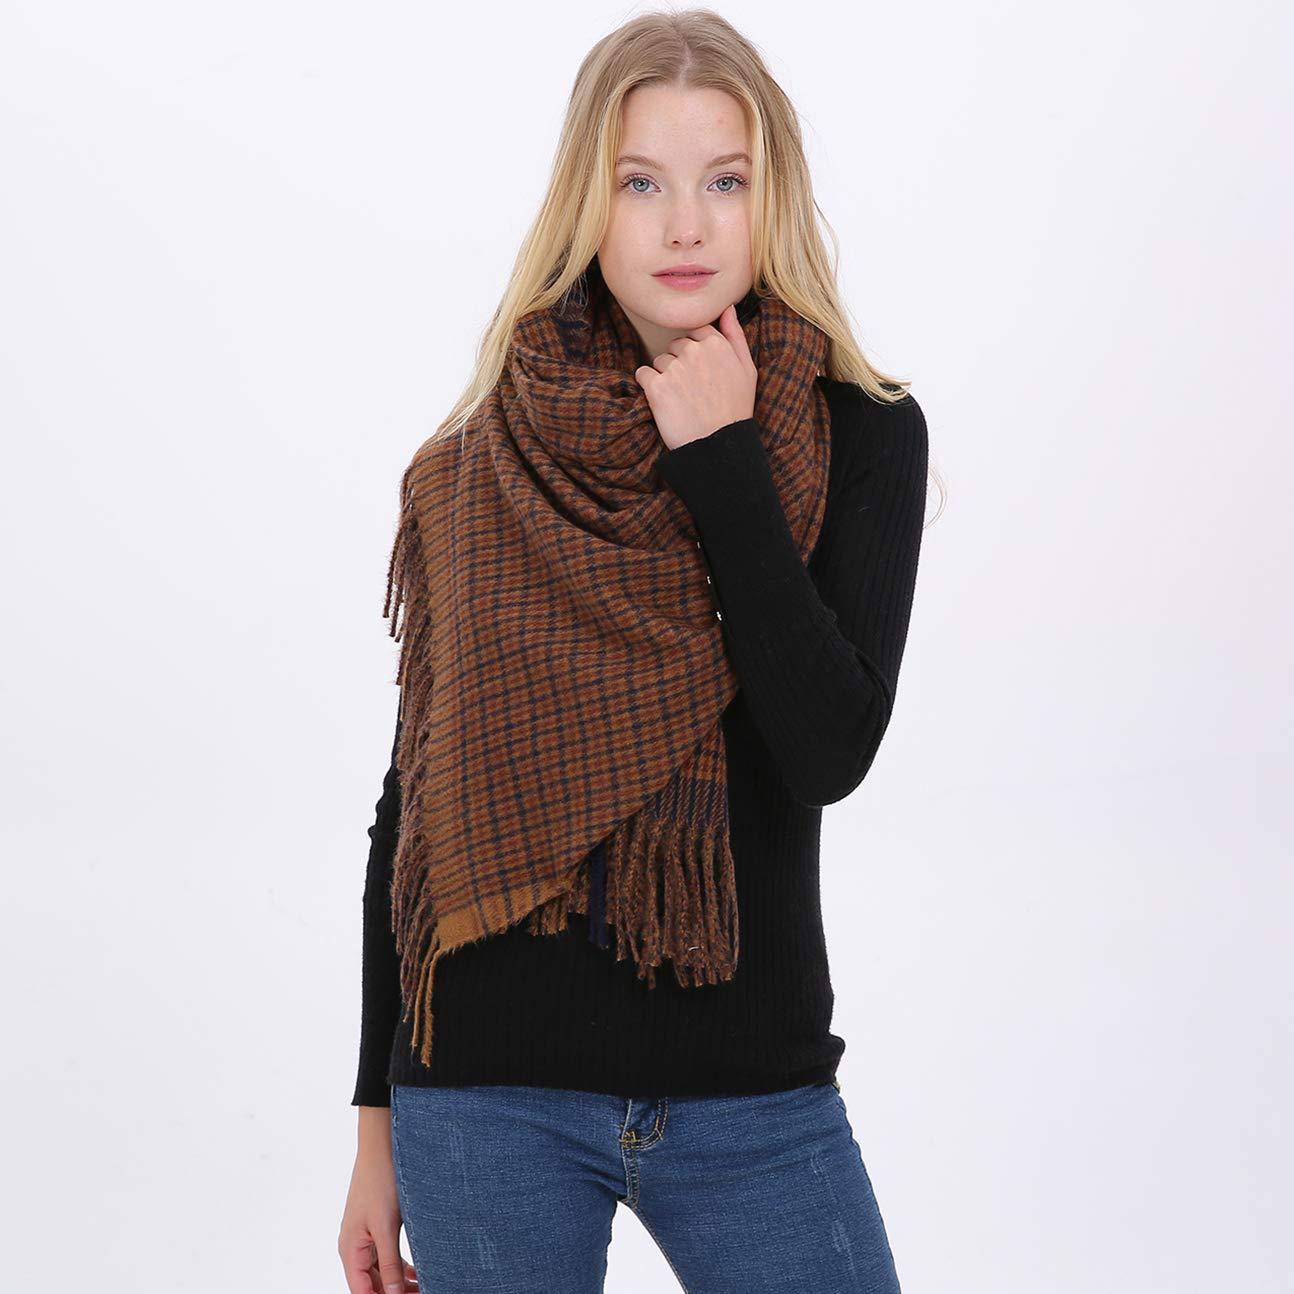 Longwu Ladies Gift Idea Cashmere Pashmina Sciarpa scozzese Moda calda lana Wrap Scialle invernale Stola per le donne